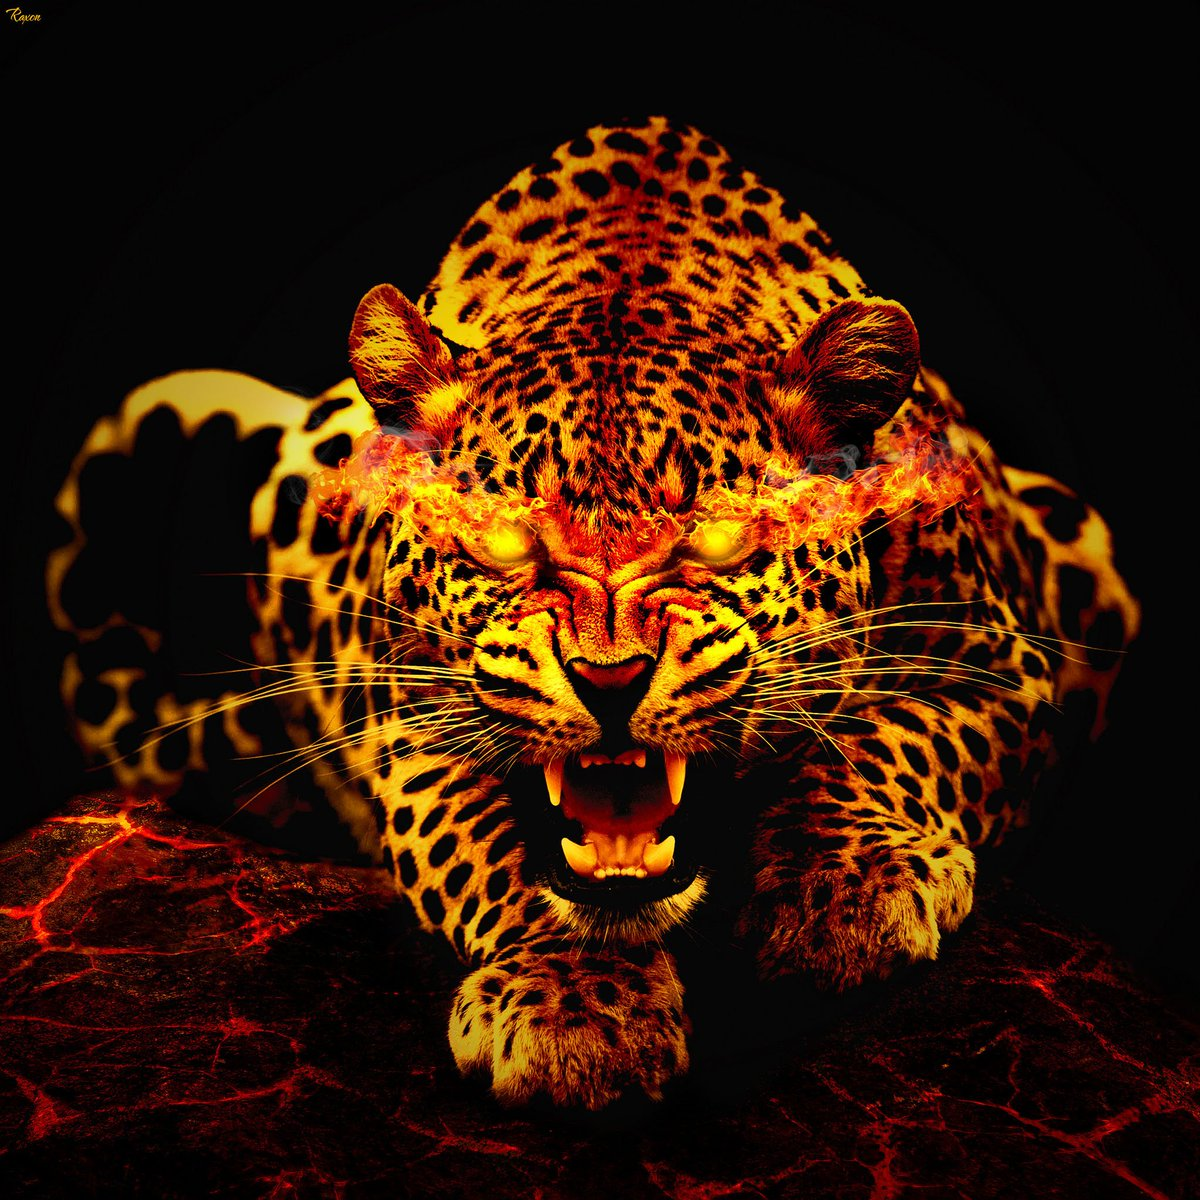 Jaguar Amoled 2570663 Hd Wallpaper Backgrounds Download